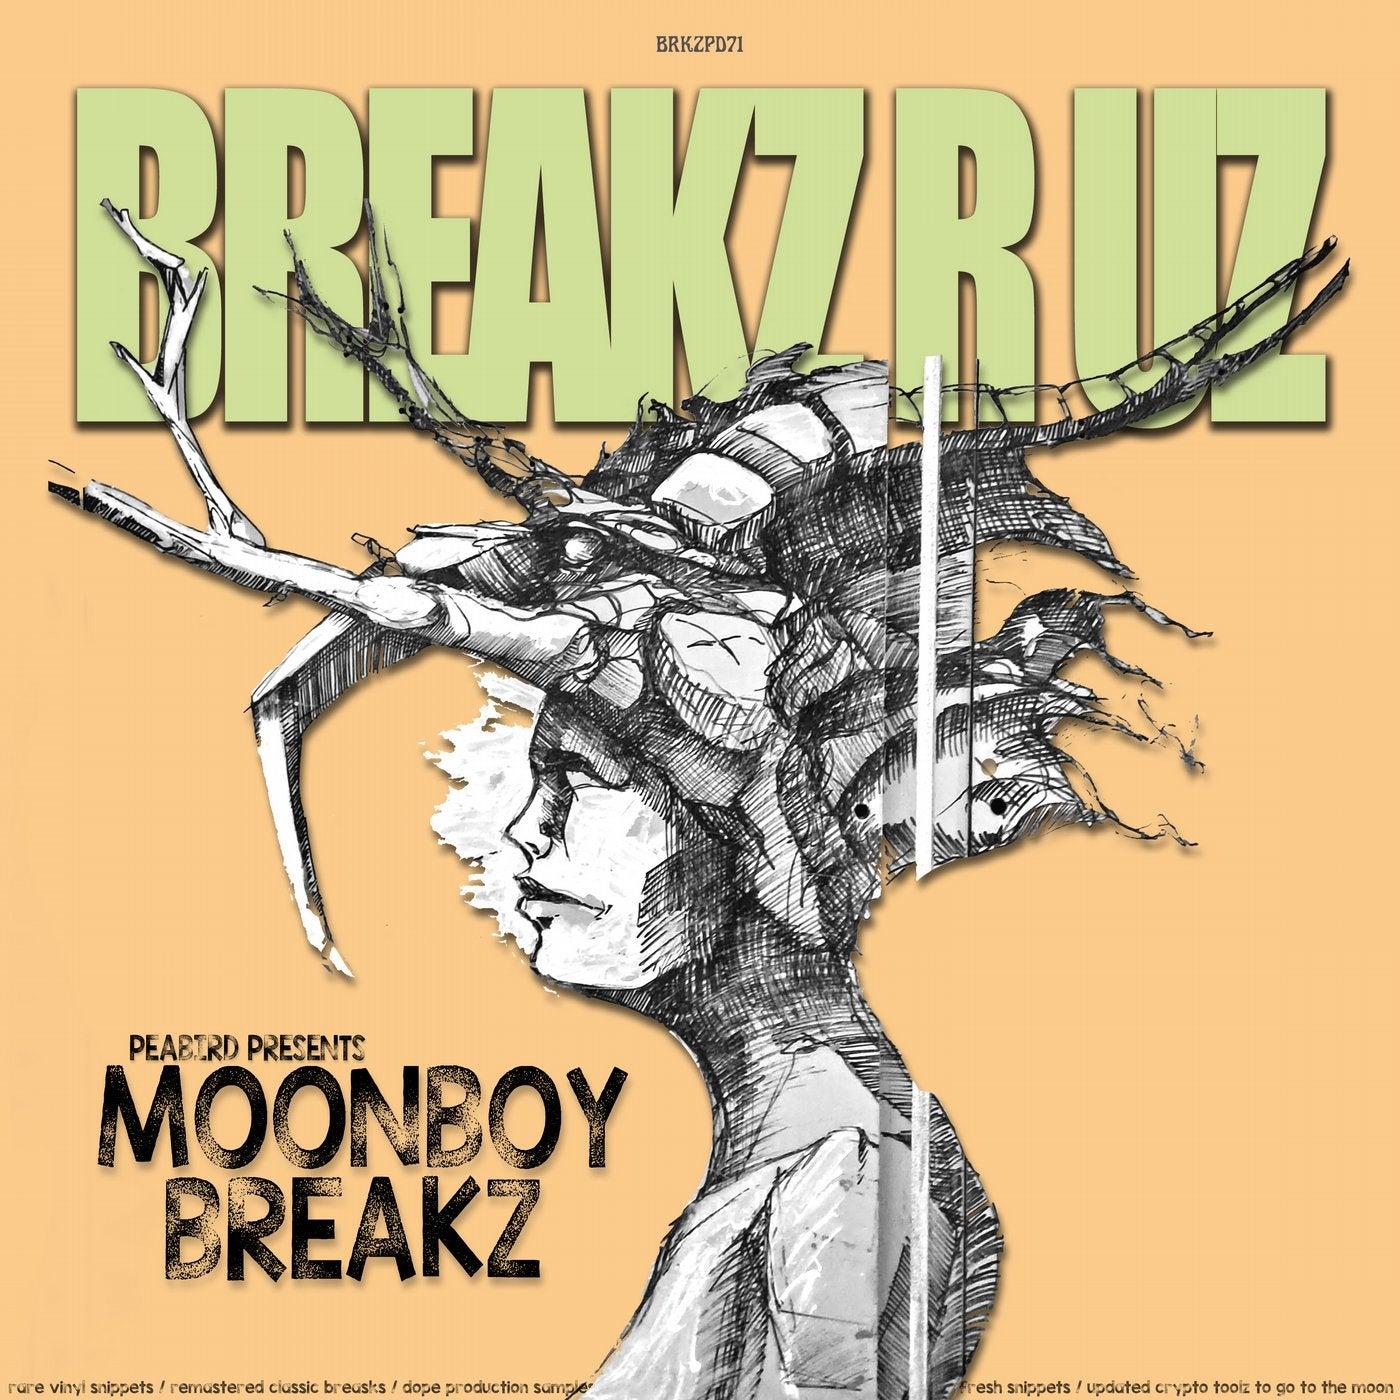 Moonboy Vocals (Ripped Off Vinyl Samples)